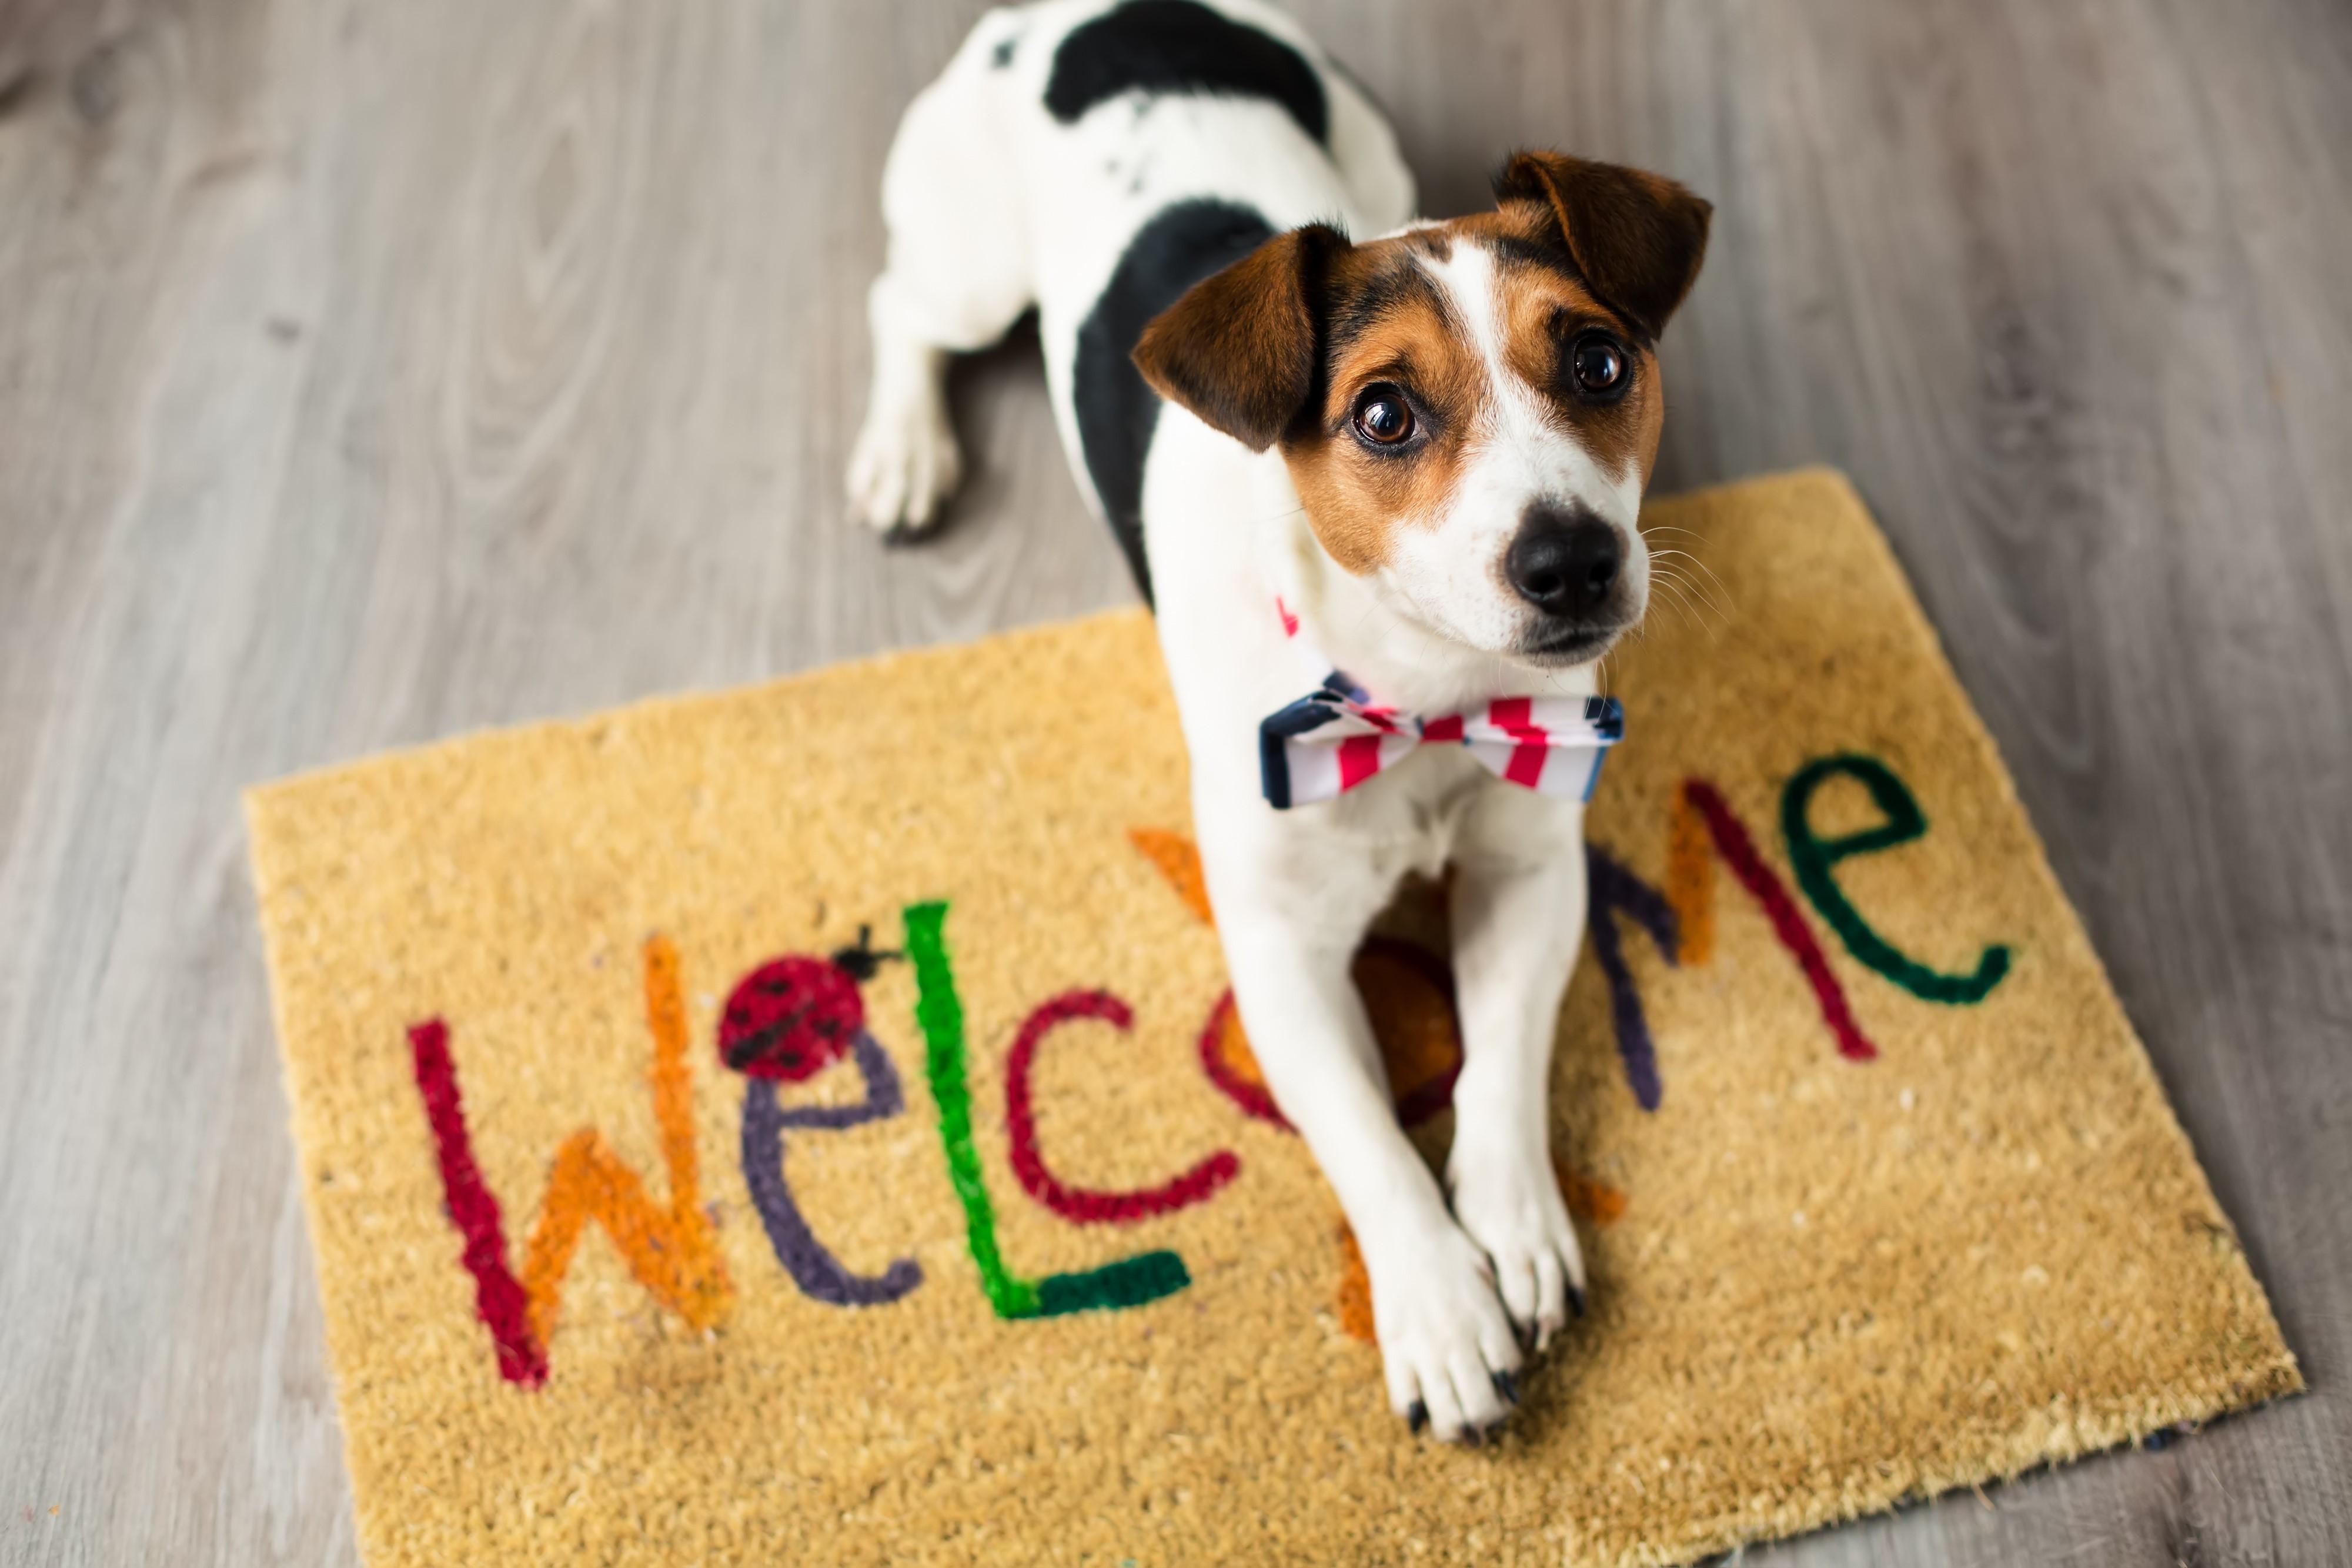 Adoption process at Warrington Animal Welfare